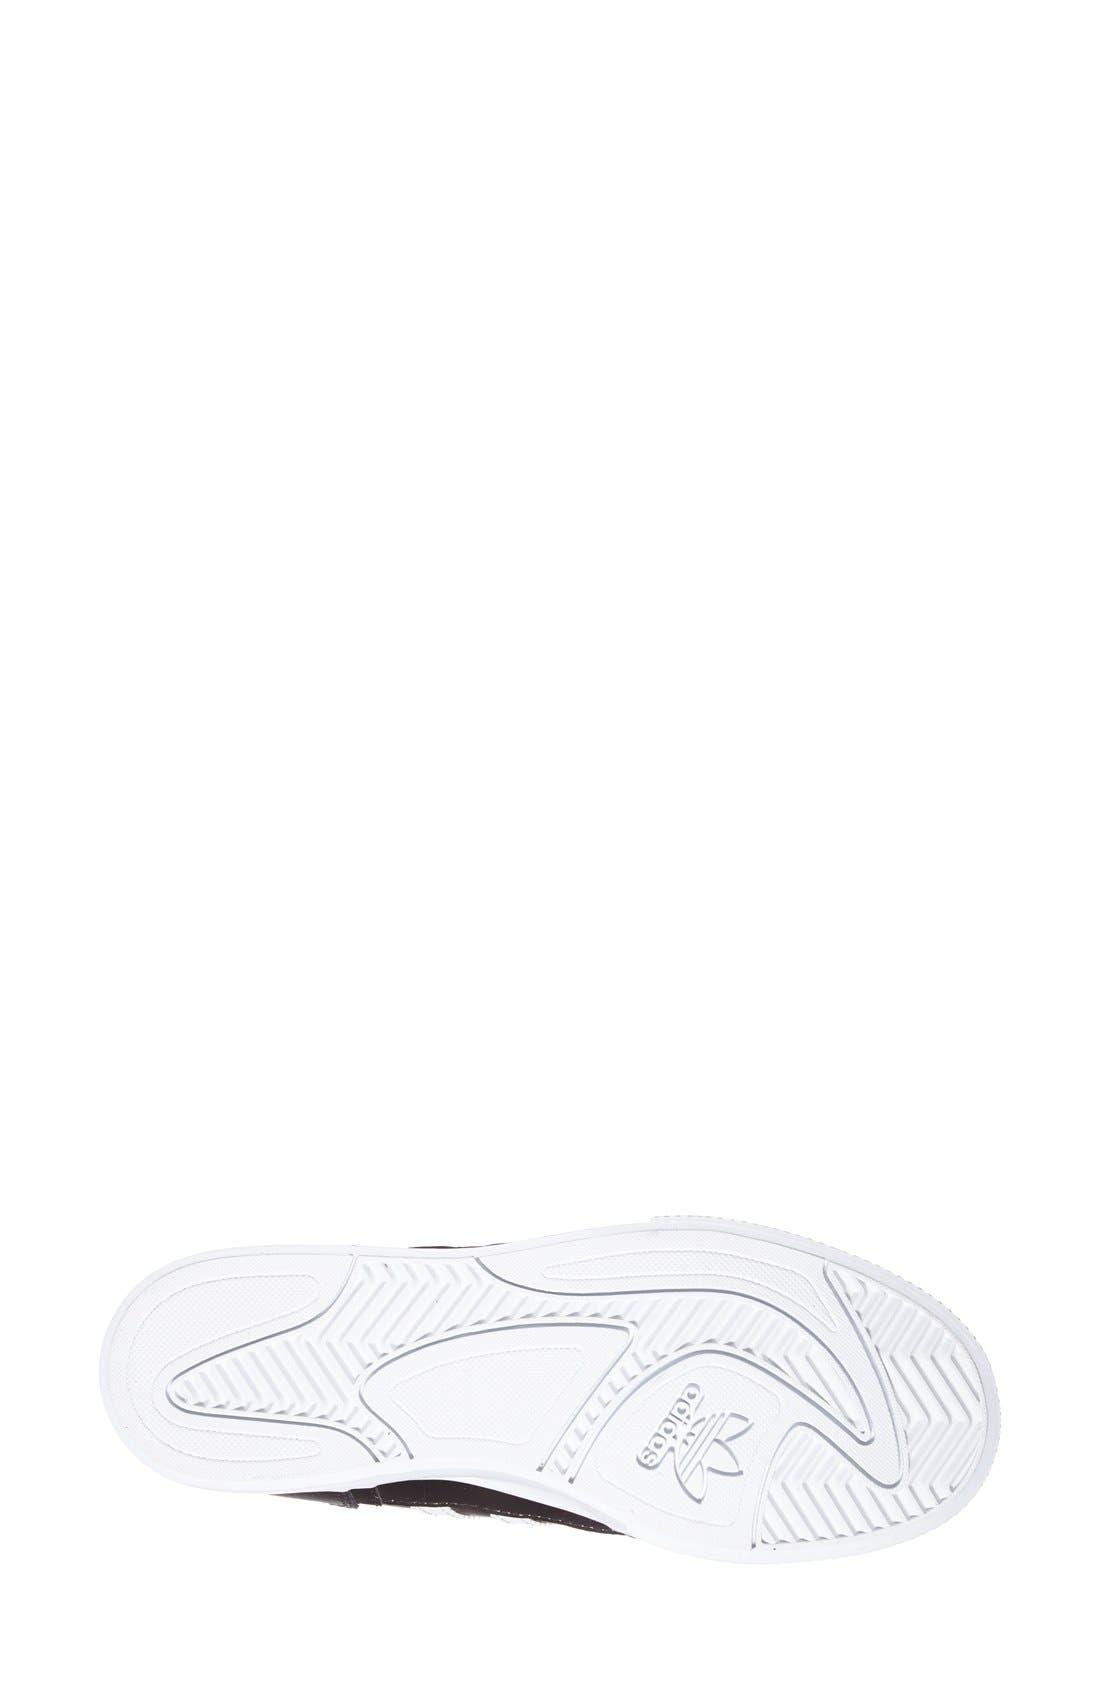 'Extaball' High Top Sneaker,                             Alternate thumbnail 4, color,                             001